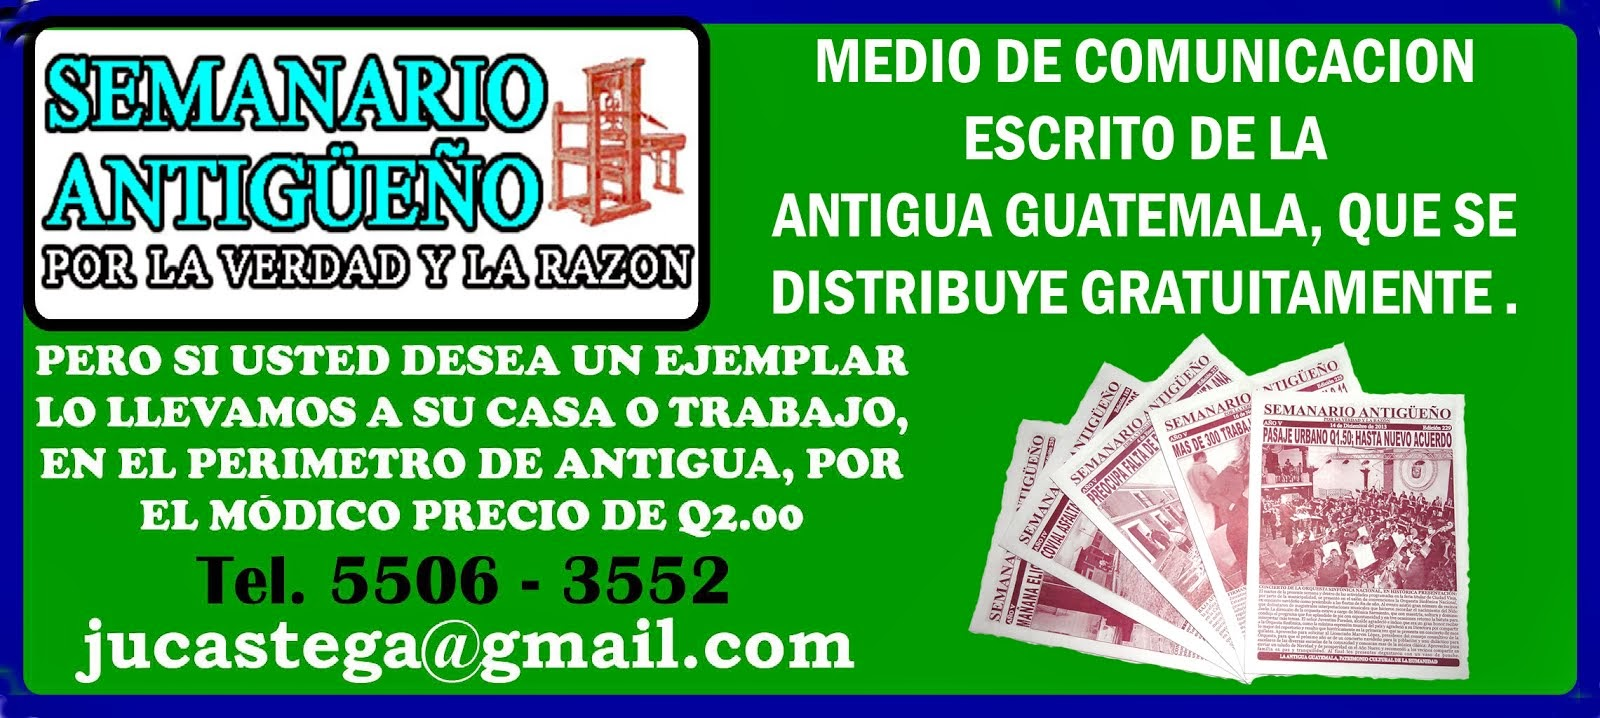 MEDIO DE COMUNICACION DE ANTIGUA GUATE.